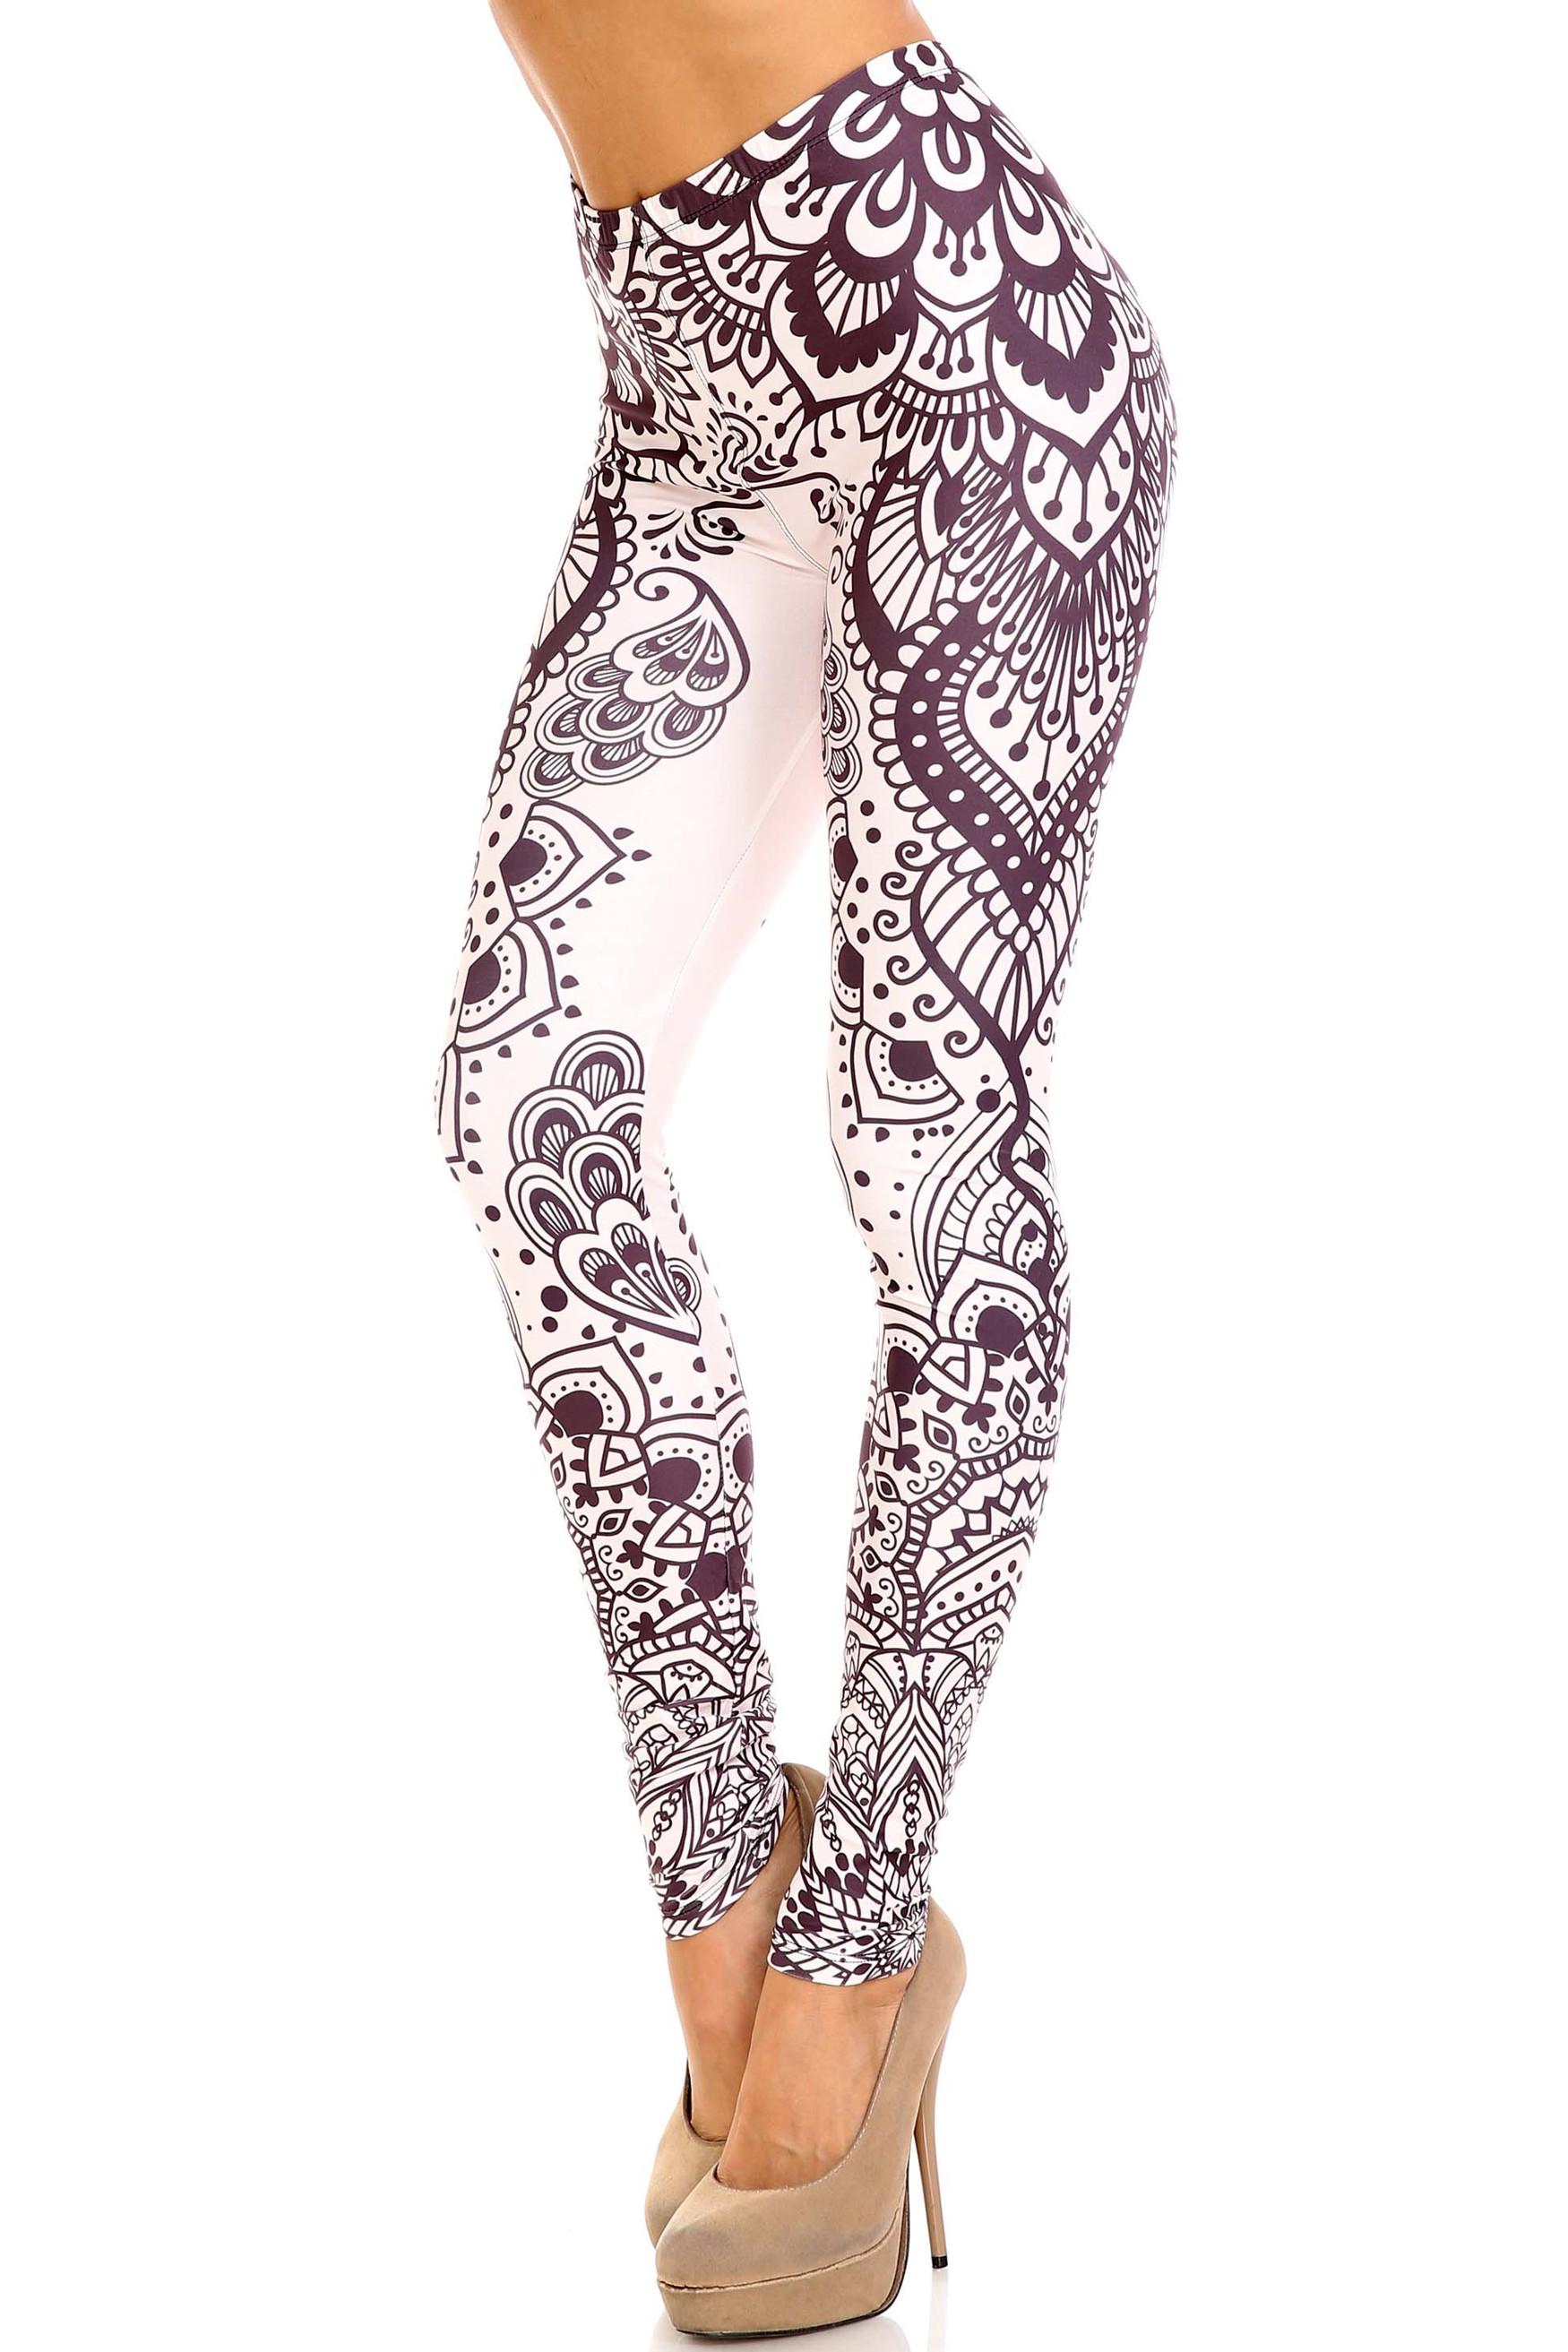 Creamy Soft Creamy Tribal Mandala Plus Size Leggings - USA Fashion™